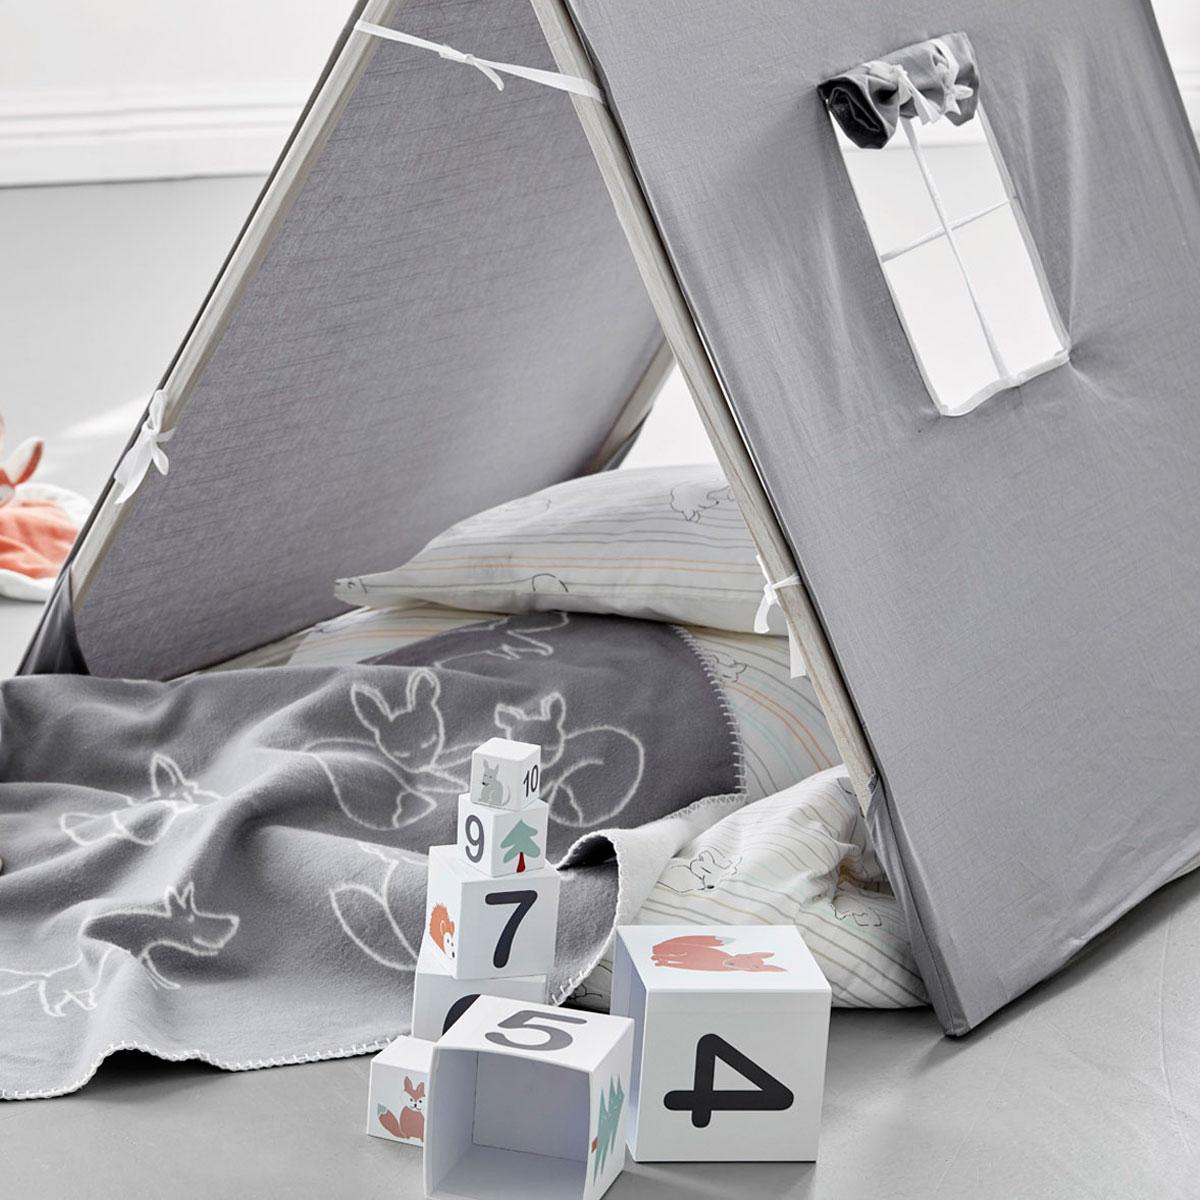 kids concept zelt x grau aus stoff und holz 201935 pirum. Black Bedroom Furniture Sets. Home Design Ideas